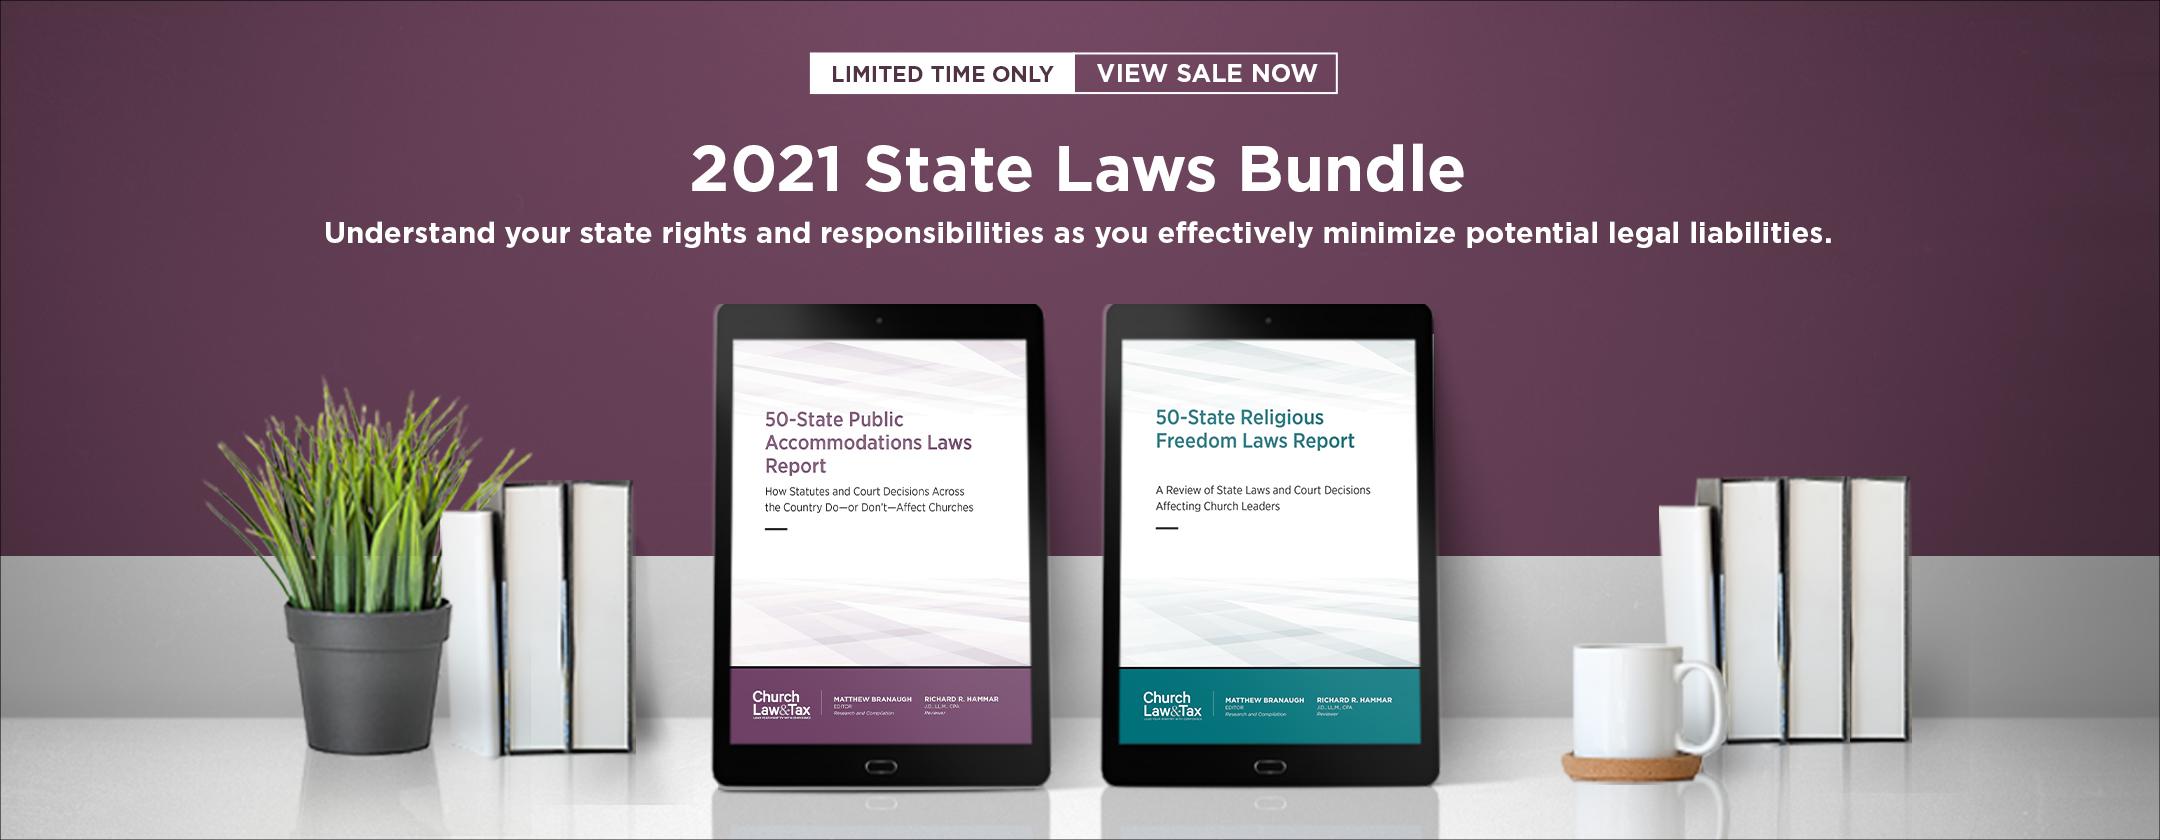 2021-state-laws-bundle-carousel-banner-ad.jpg